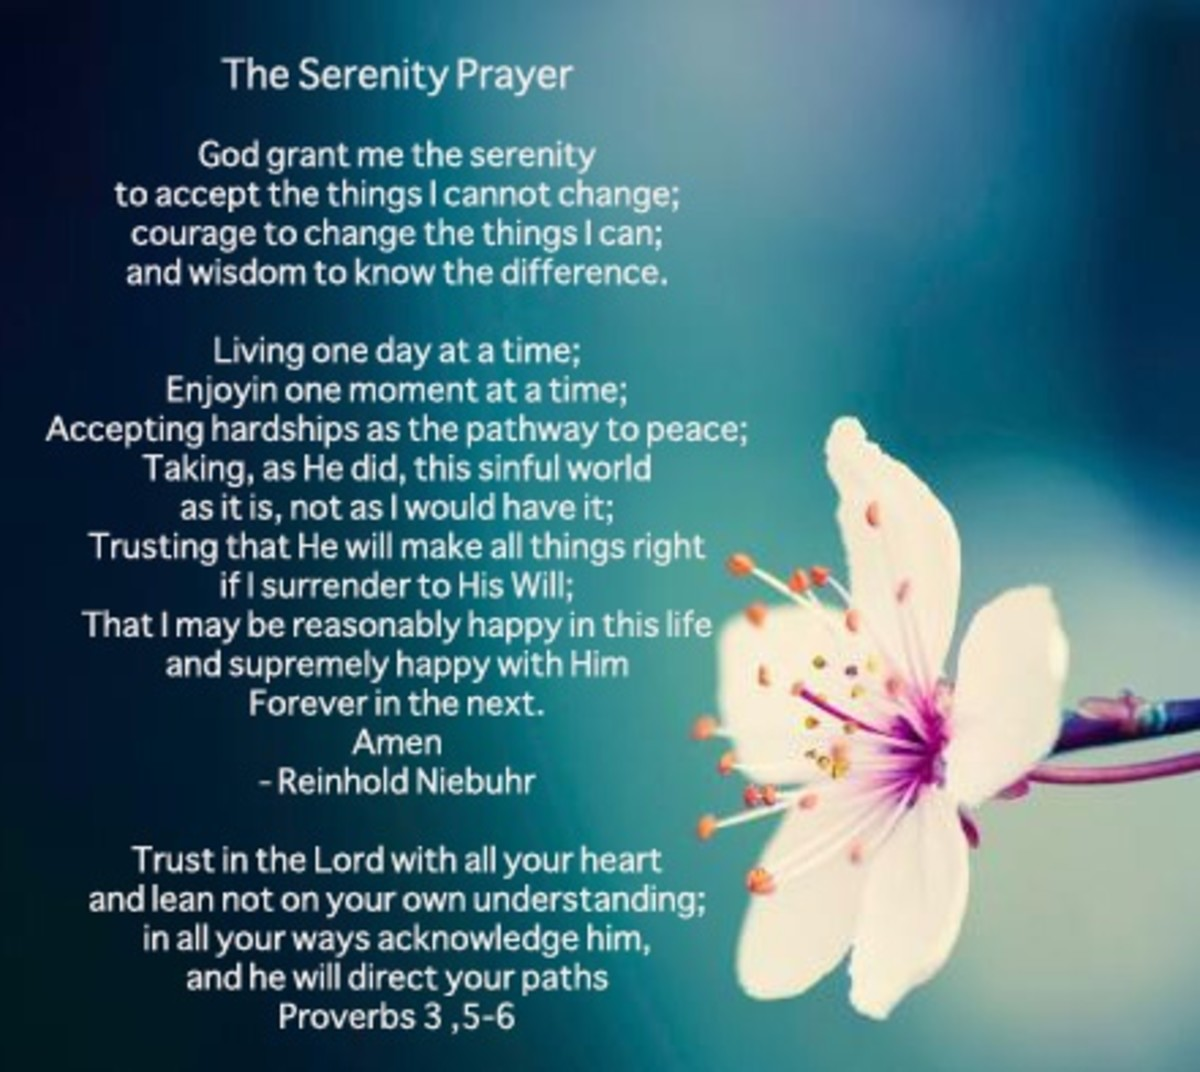 god-grant-me-the-serenity